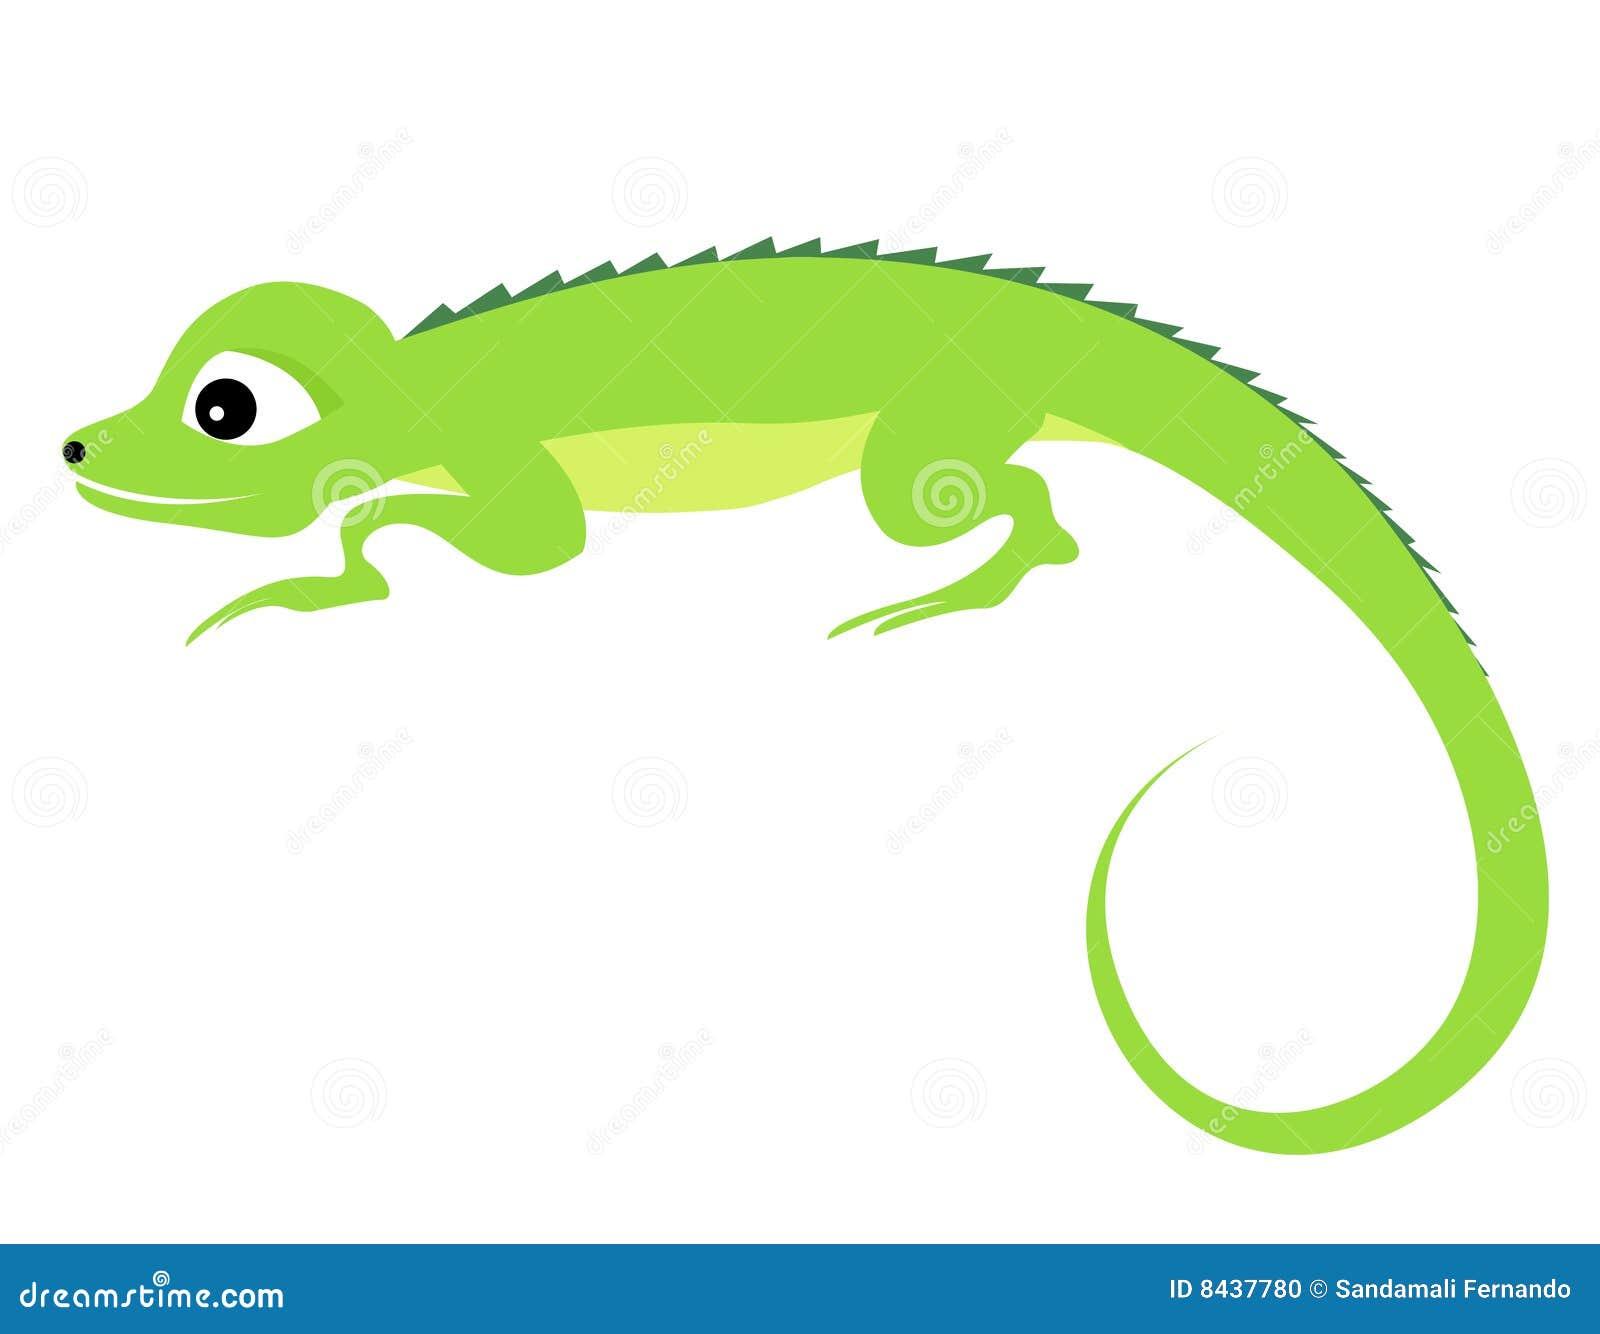 Cute cartoon illustration of an Iguana isolated on white background.